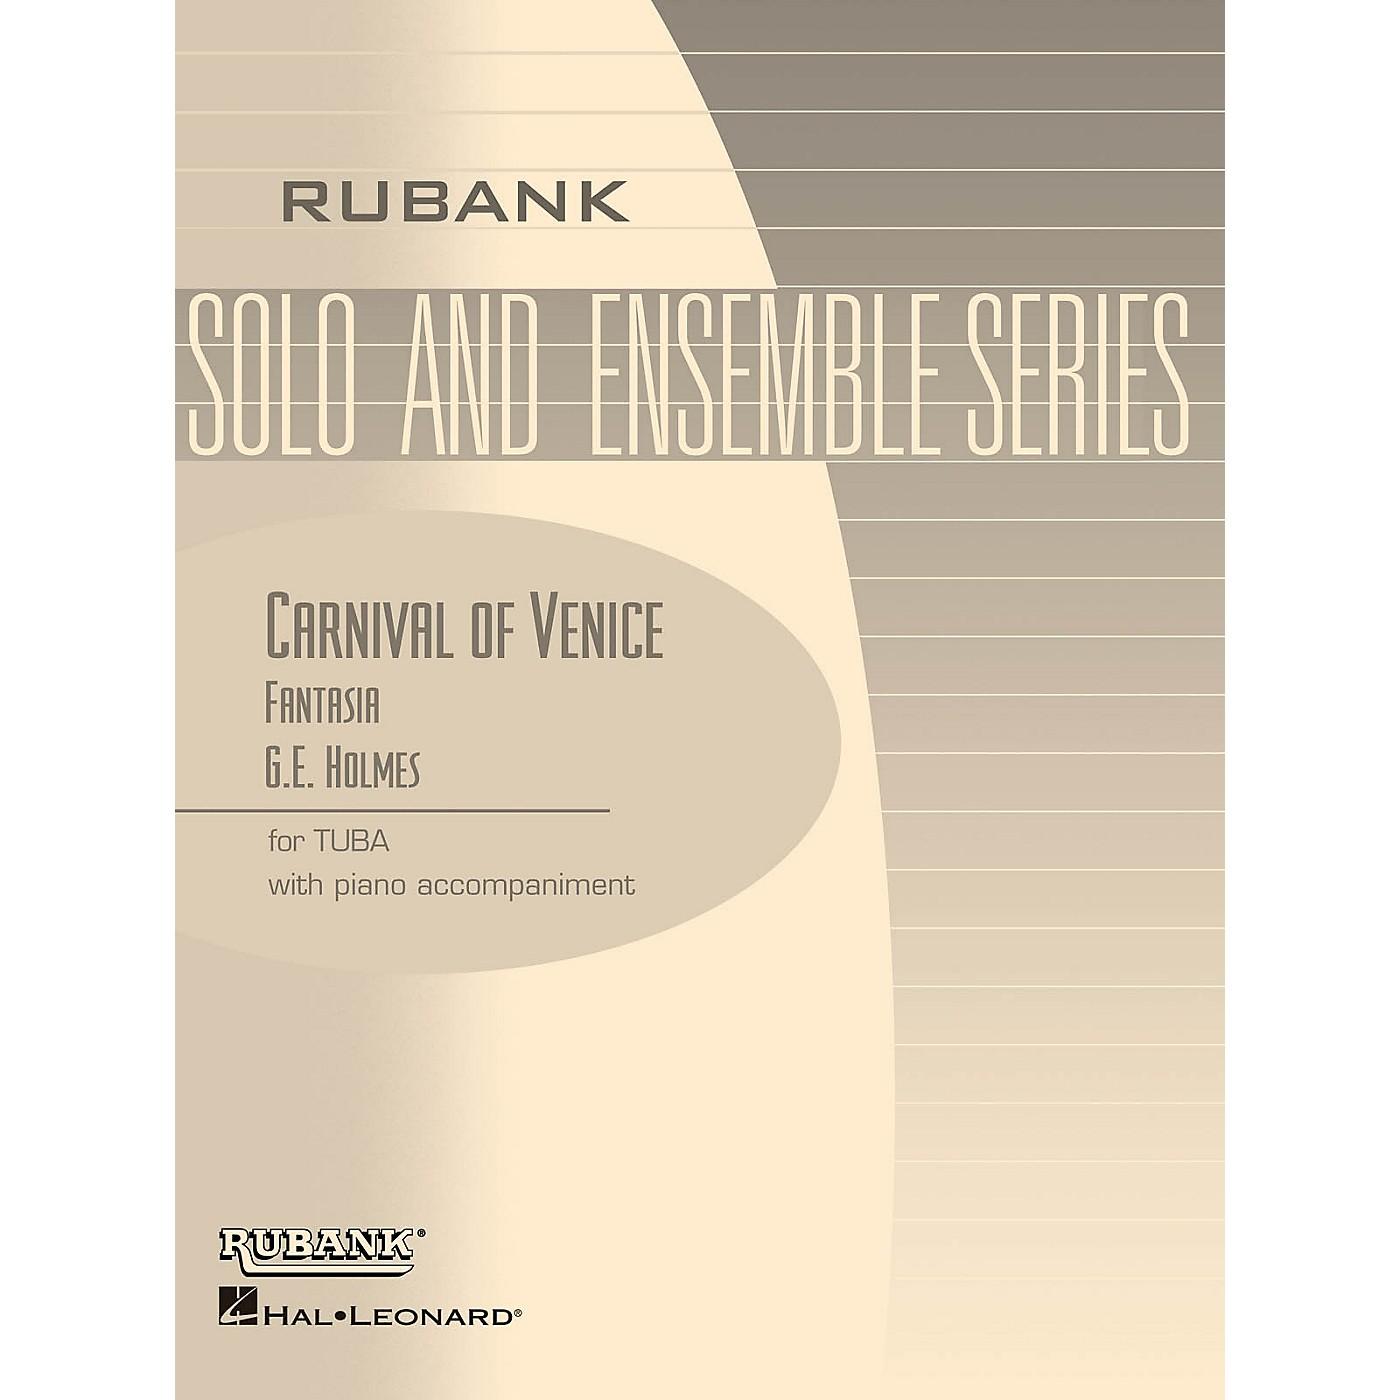 Rubank Publications Carnival of Venice (Fantasia) Rubank Solo/Ensemble Sheet Series Softcover thumbnail